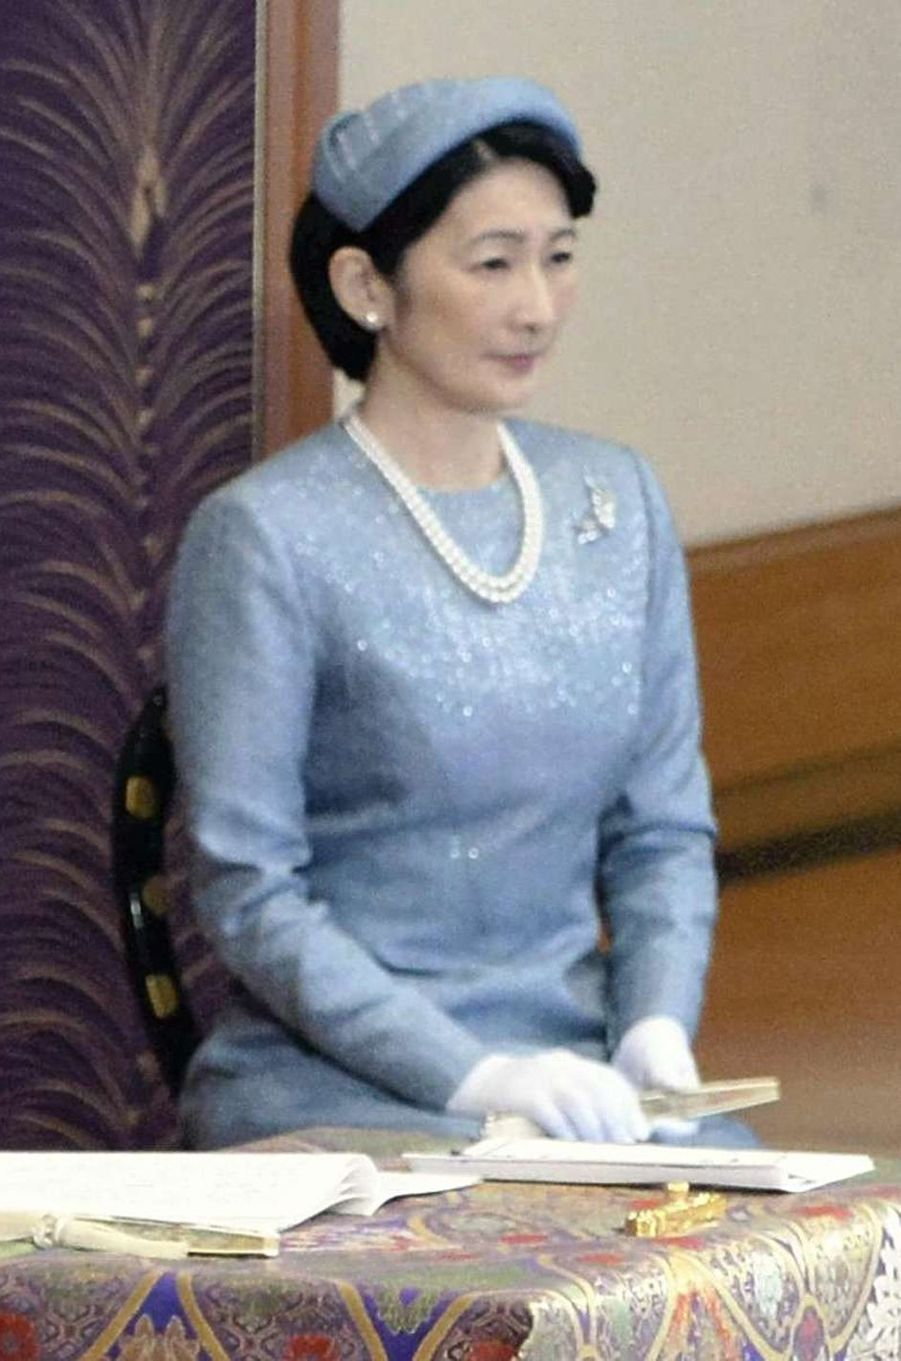 La princesse Kiko à Tokyo, le 11 janvier 2017